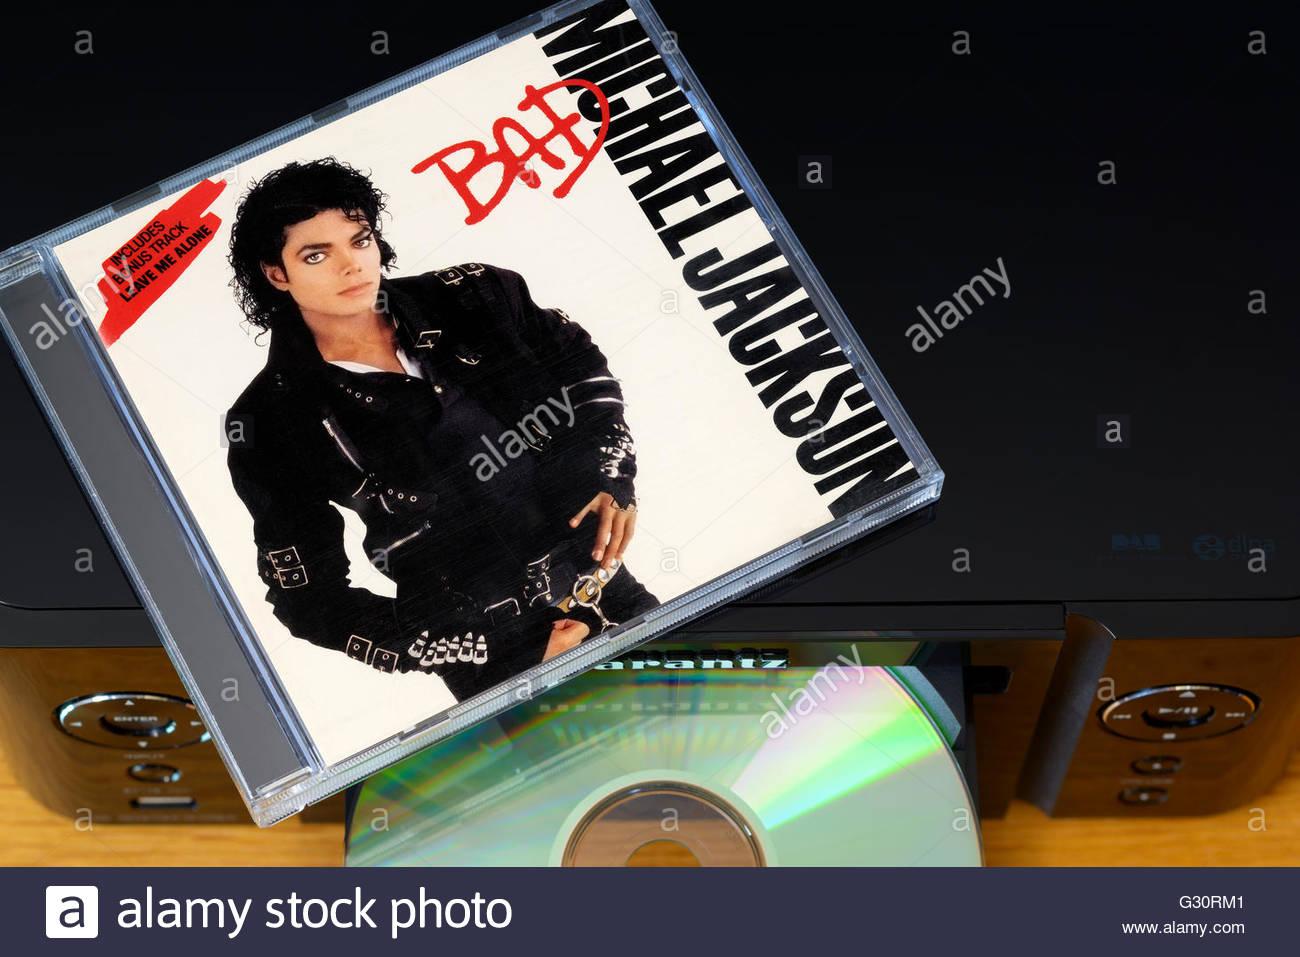 michael jackson album bad music centre and cd case england stock